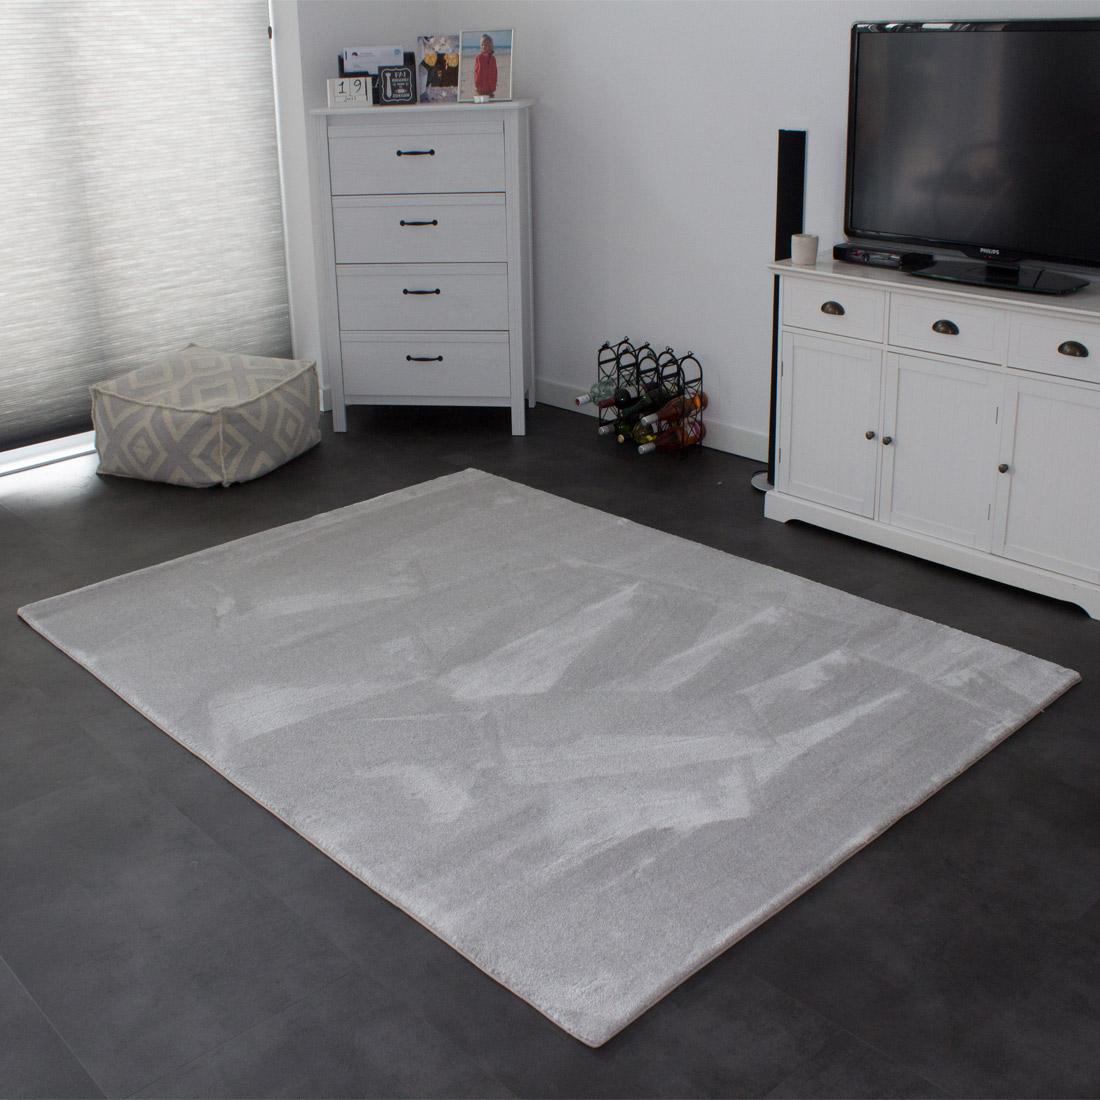 Vloerkleed Xilento Soft Pristine | 200 x 300 cm